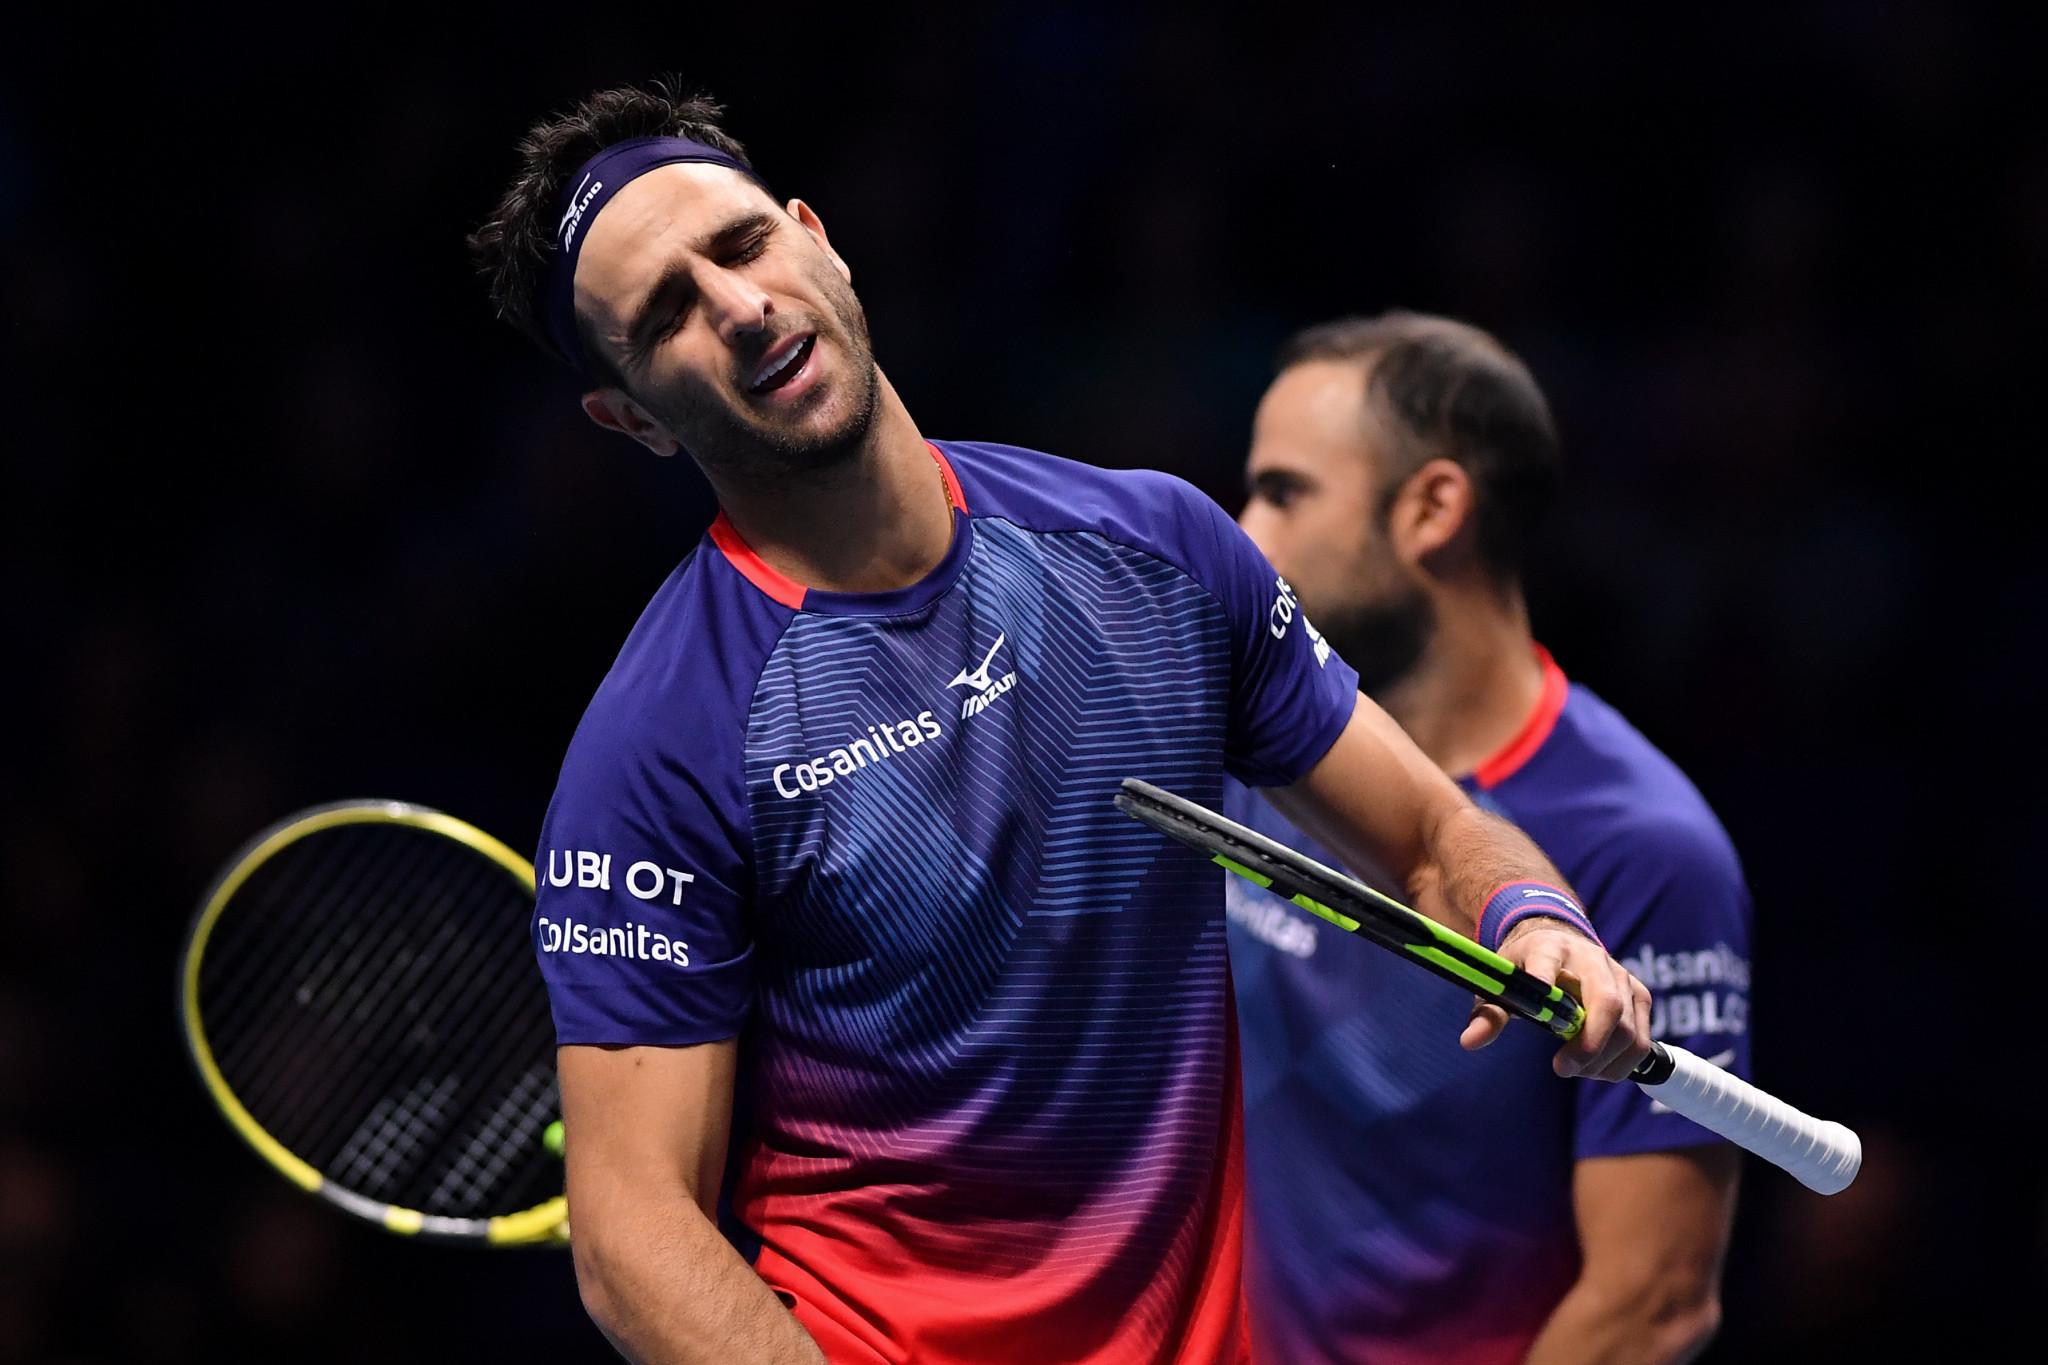 ITF confirm suspension of Wimbledon doubles champion Farah